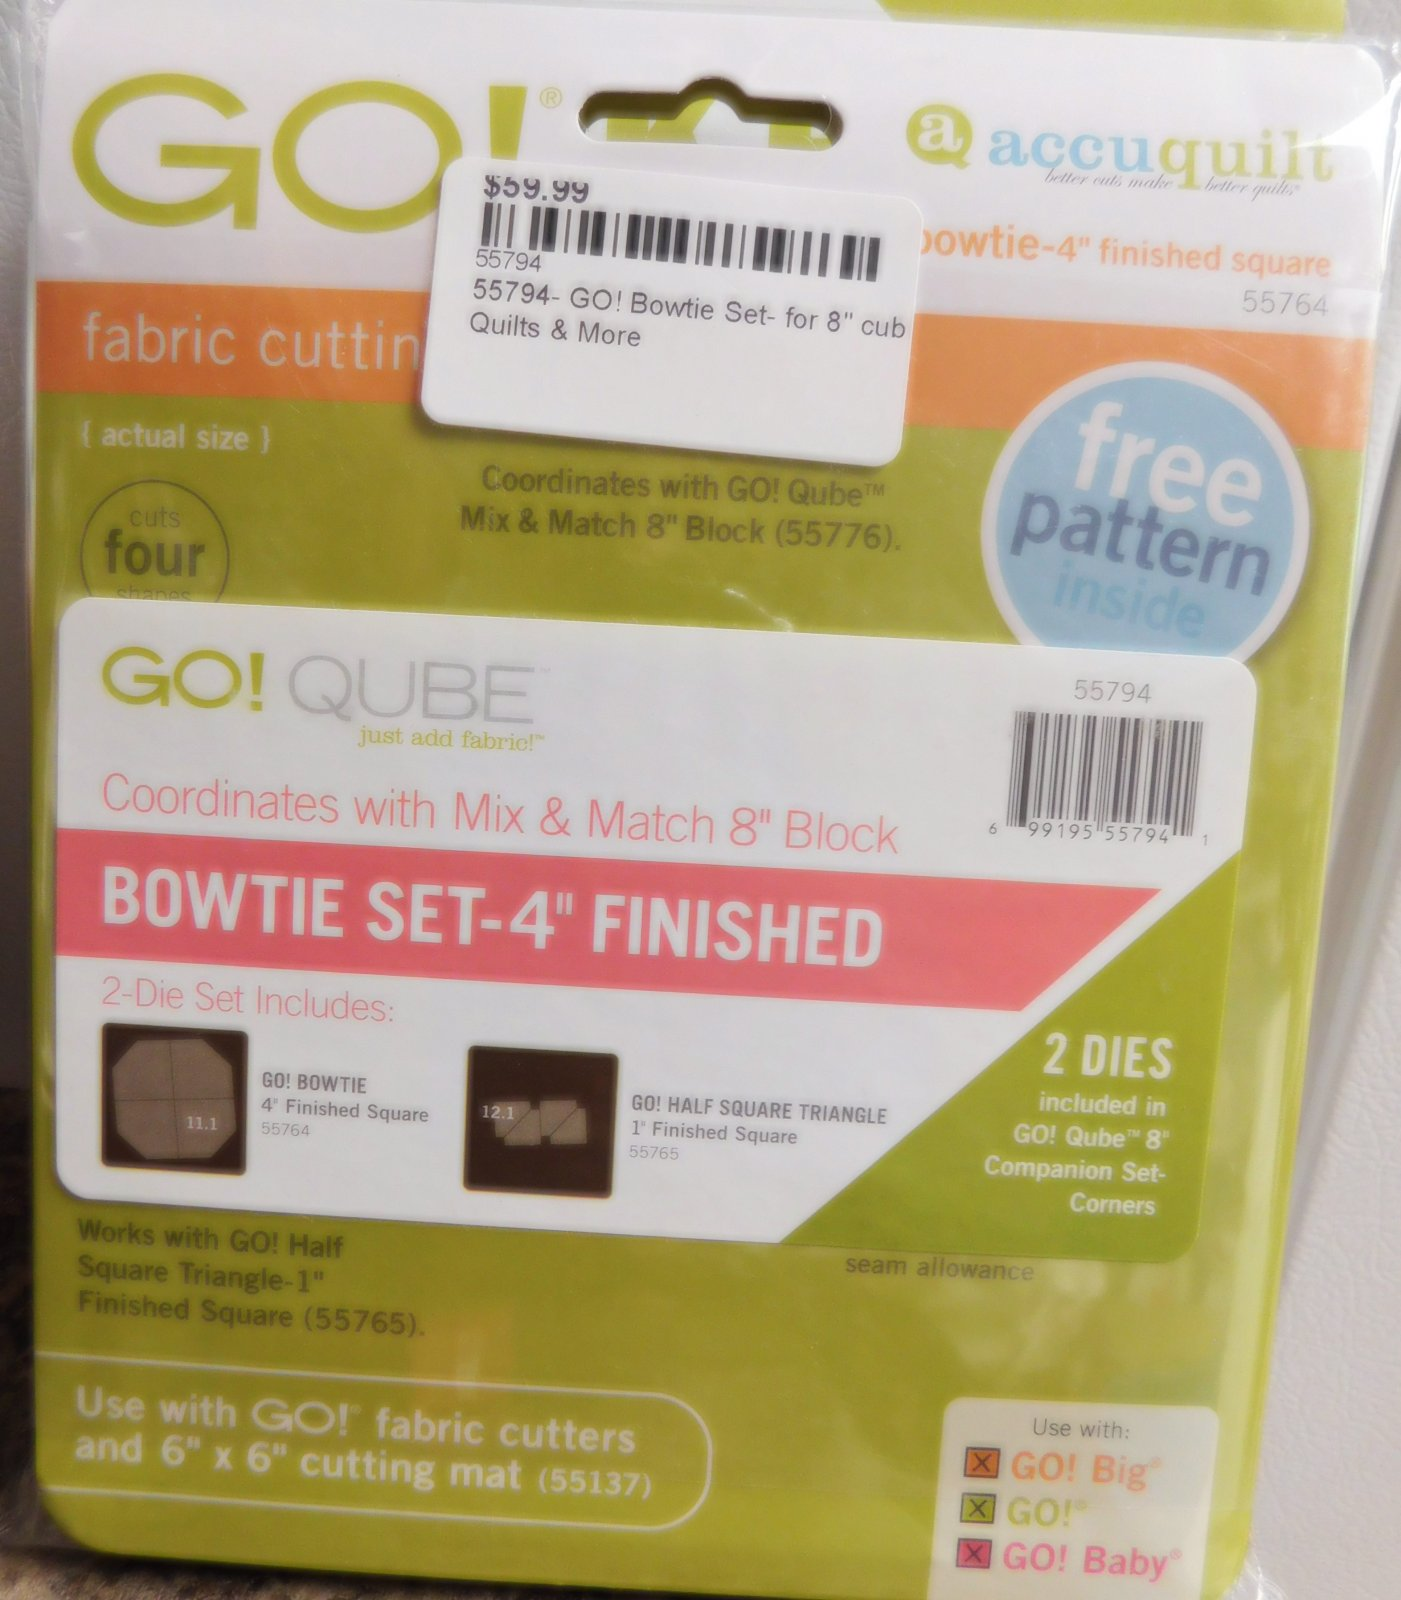 55794- GO! Bowtie Set- for 8 cube